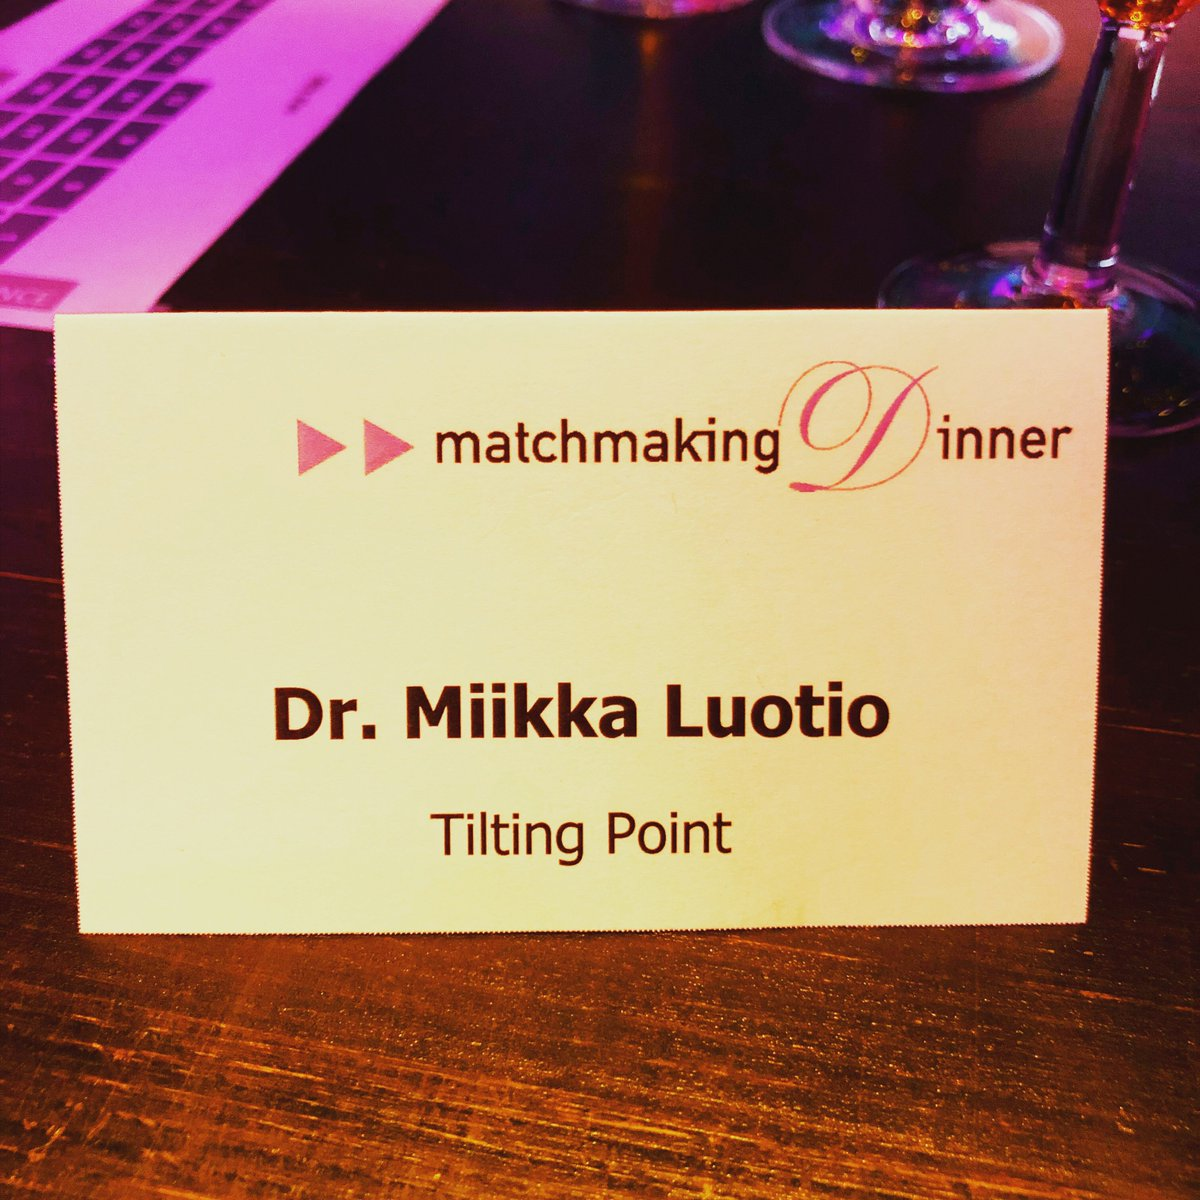 Matchmaking dinner 2018